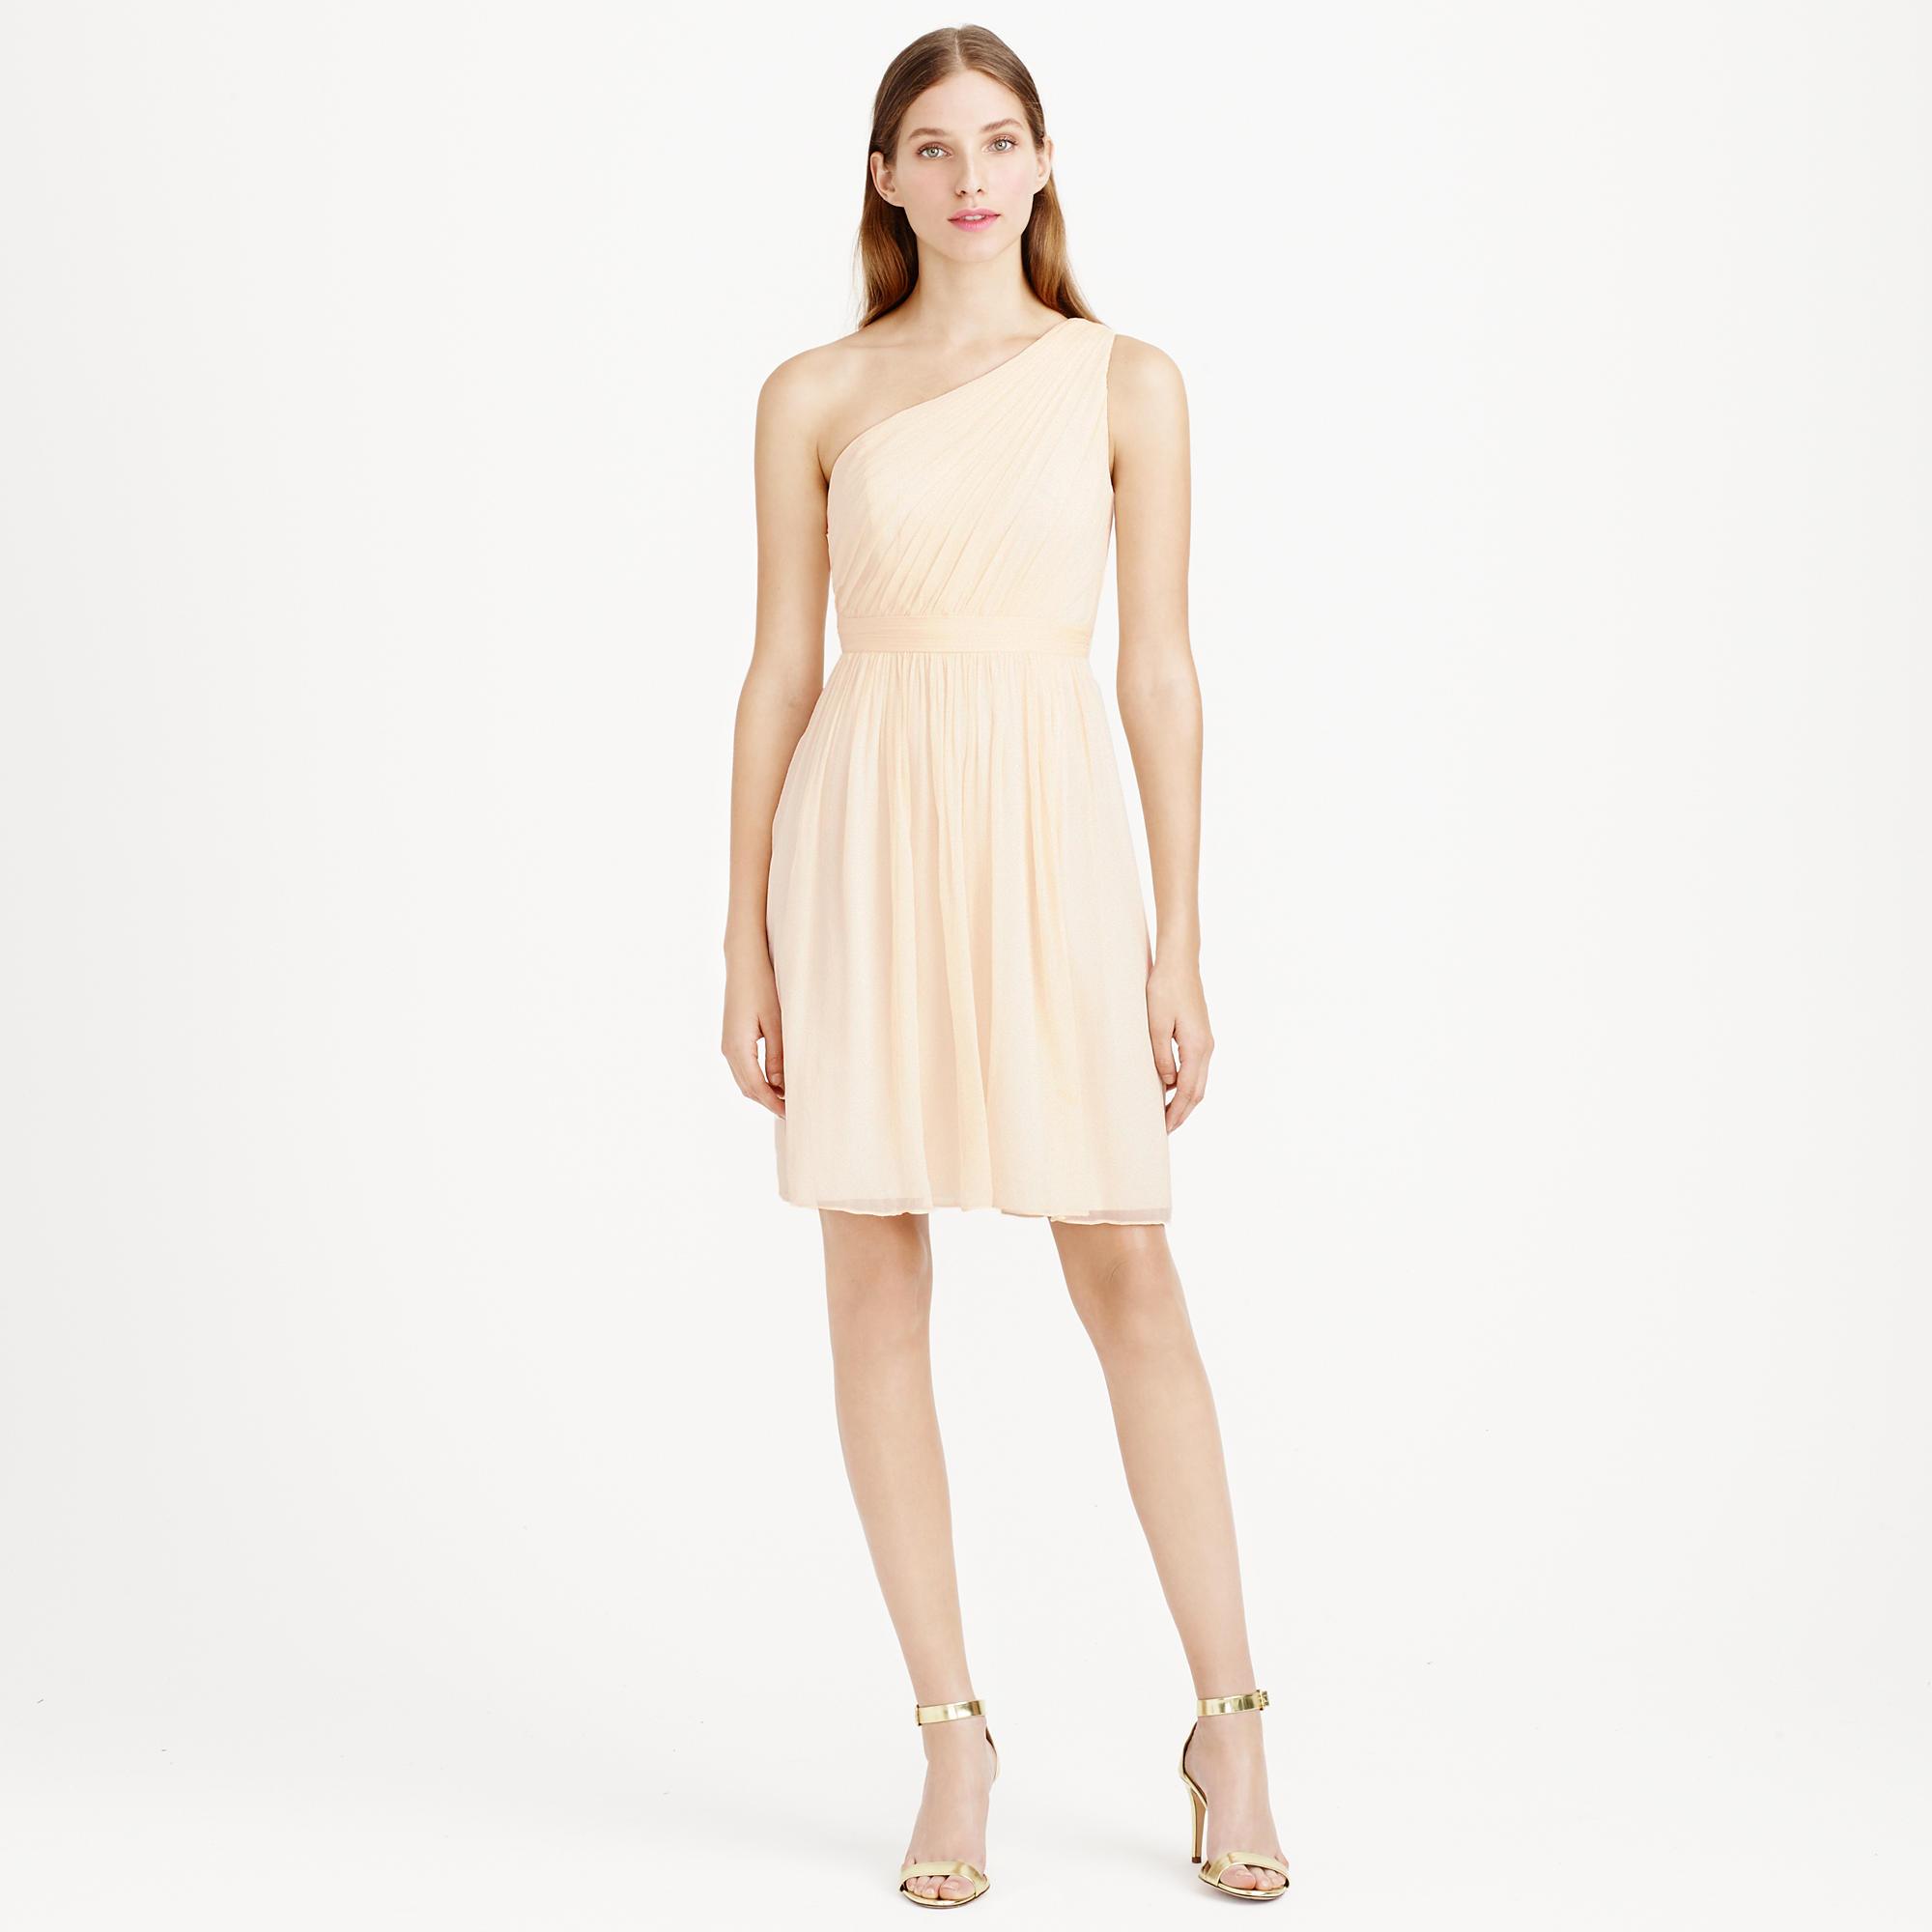 Kylie dress in silk chiffon bridesmaid dresses jew kylie dress in silk chiffon ombrellifo Gallery